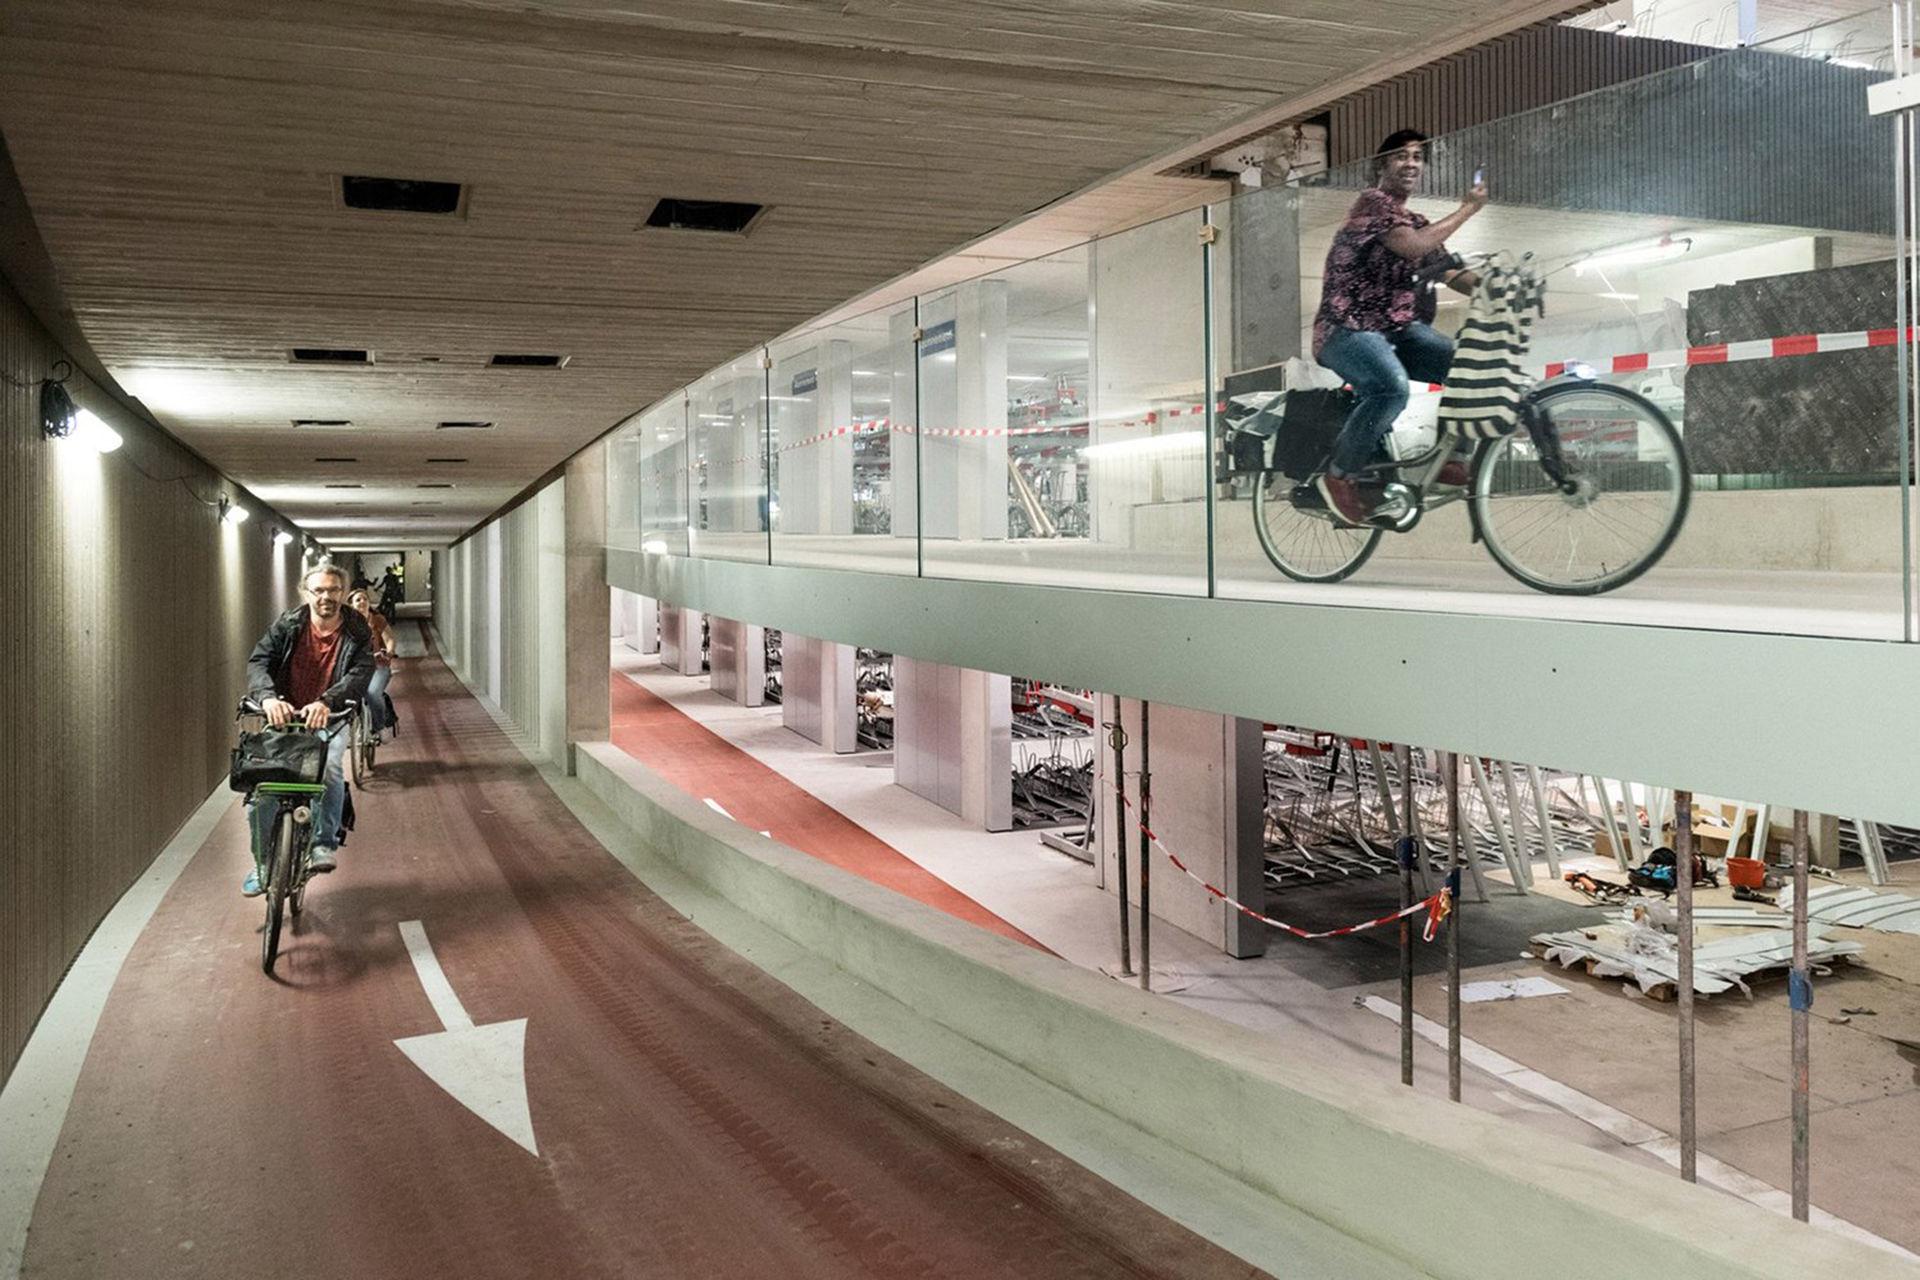 Enormt cykelgarage har öppnat i Utrecht